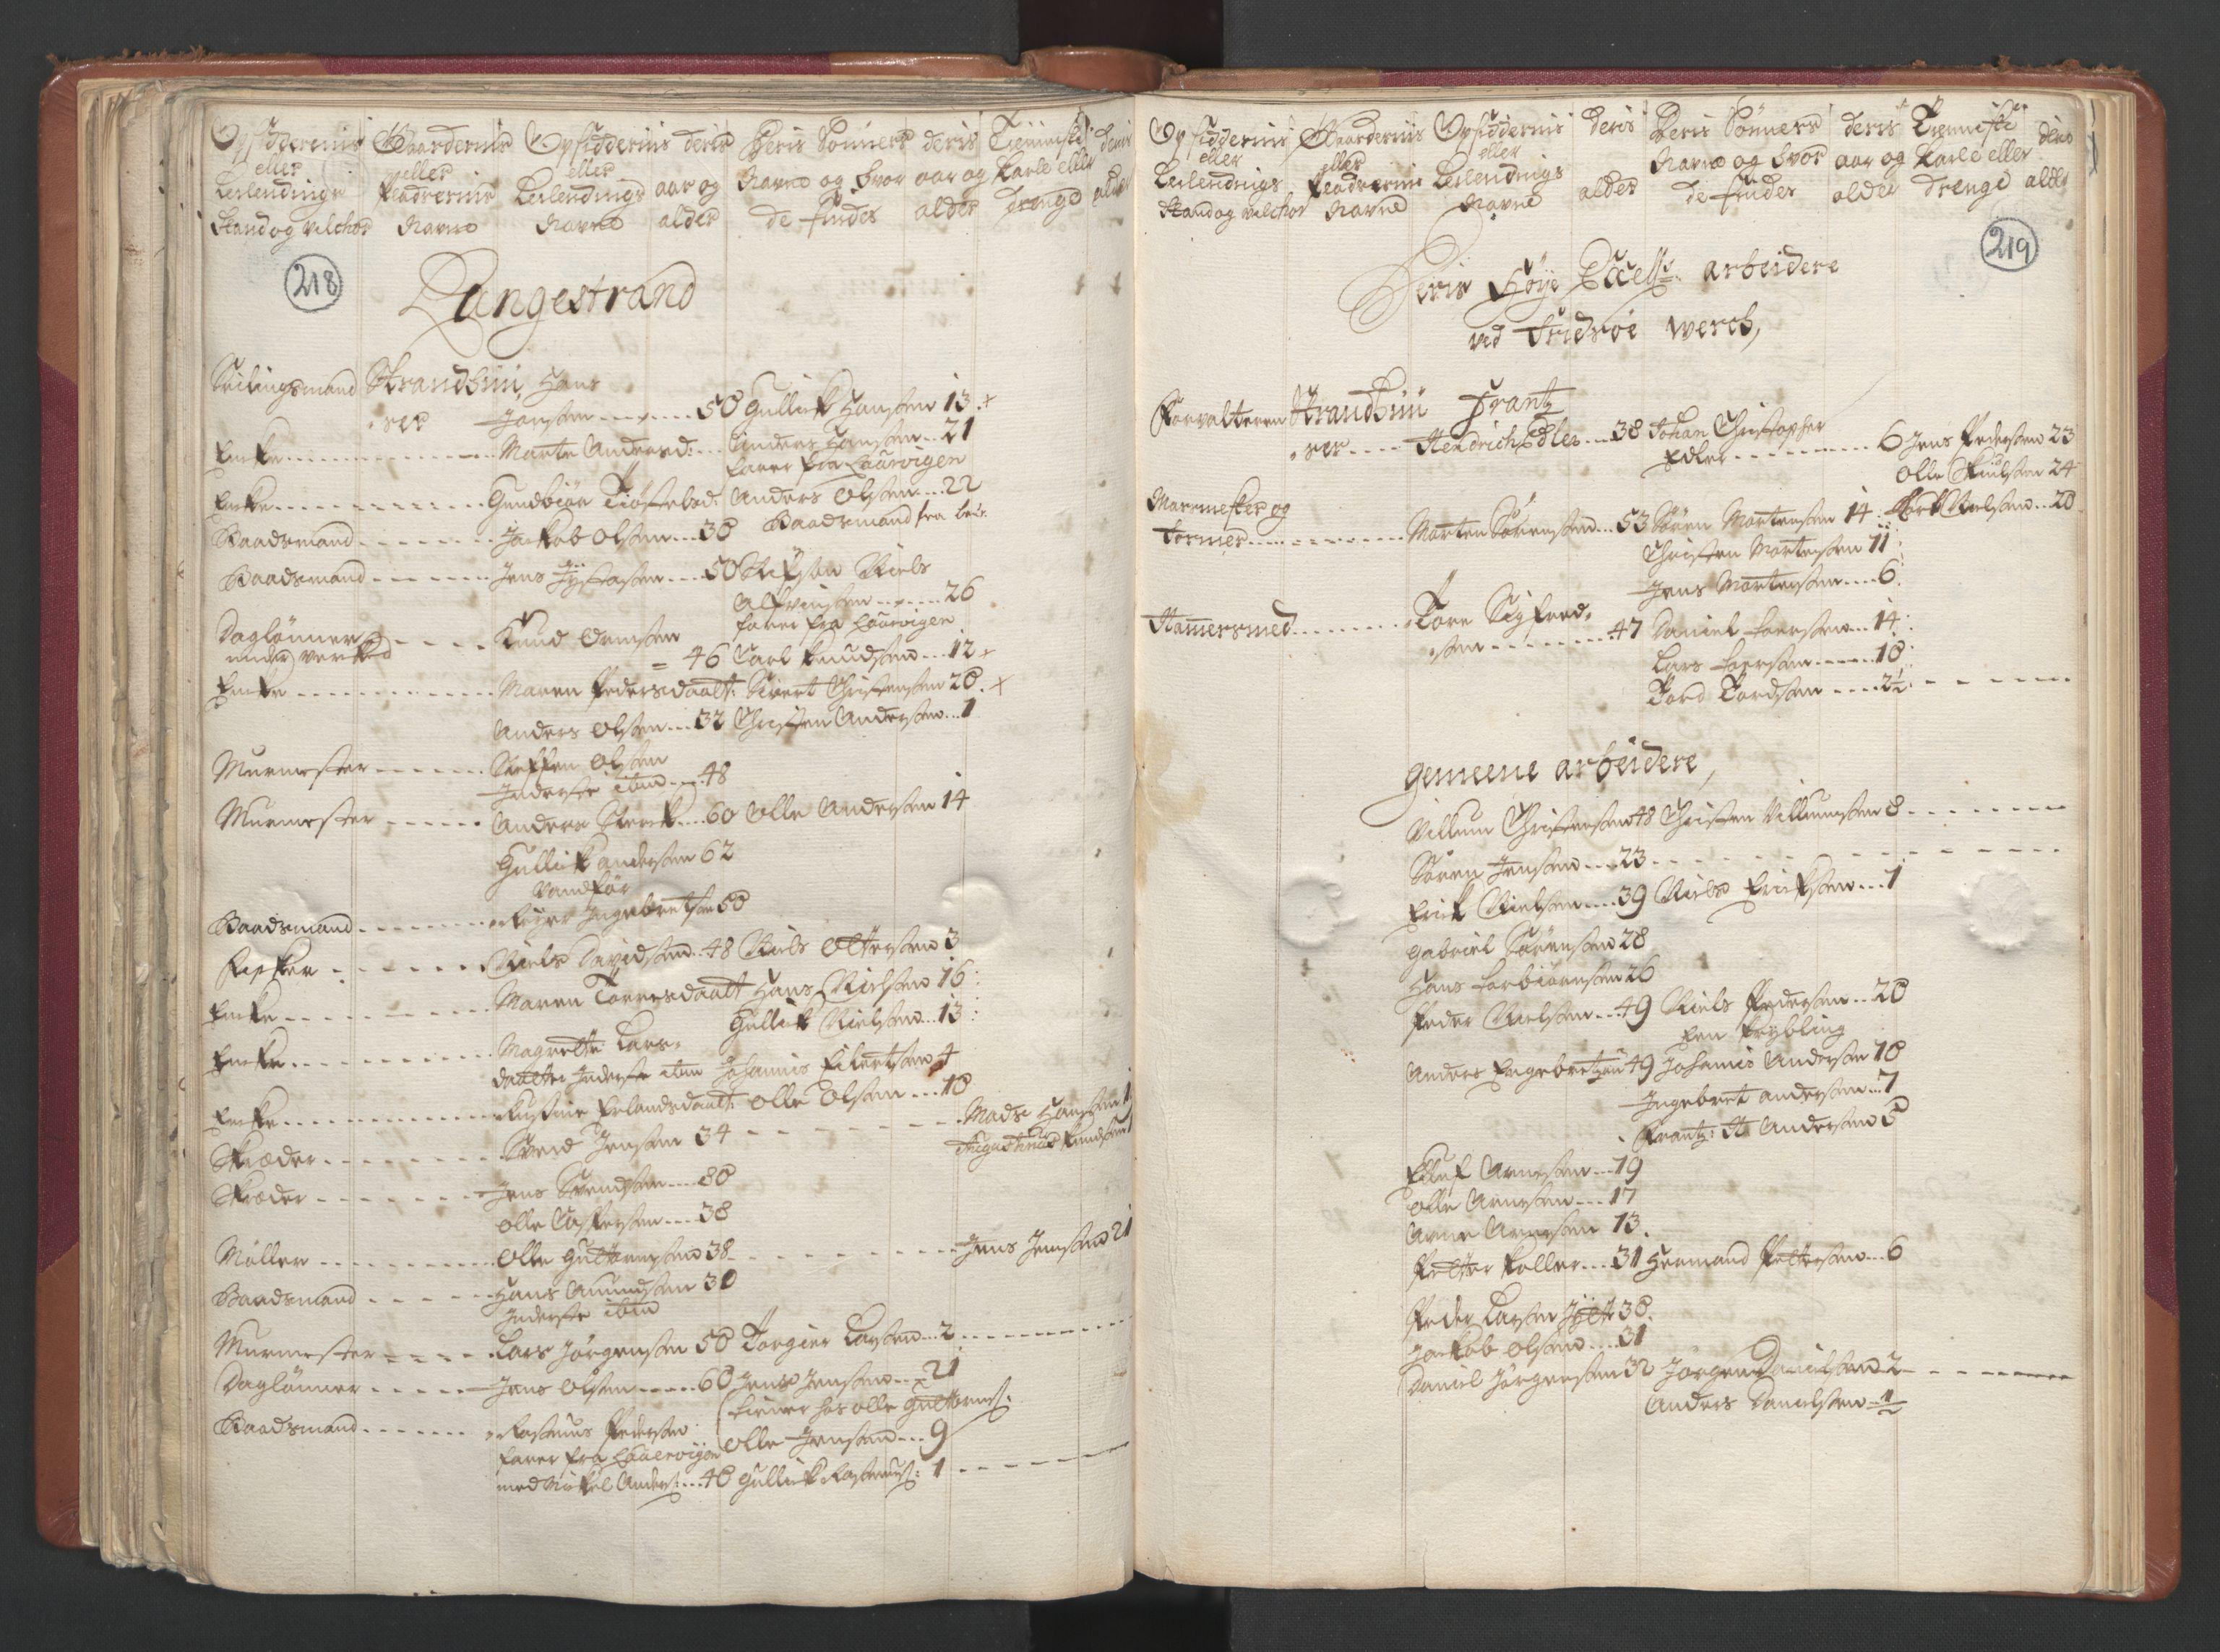 RA, Manntallet 1701, nr. 2: Solør, Odal og Østerdal fogderi og Larvik grevskap, 1701, s. 218-219